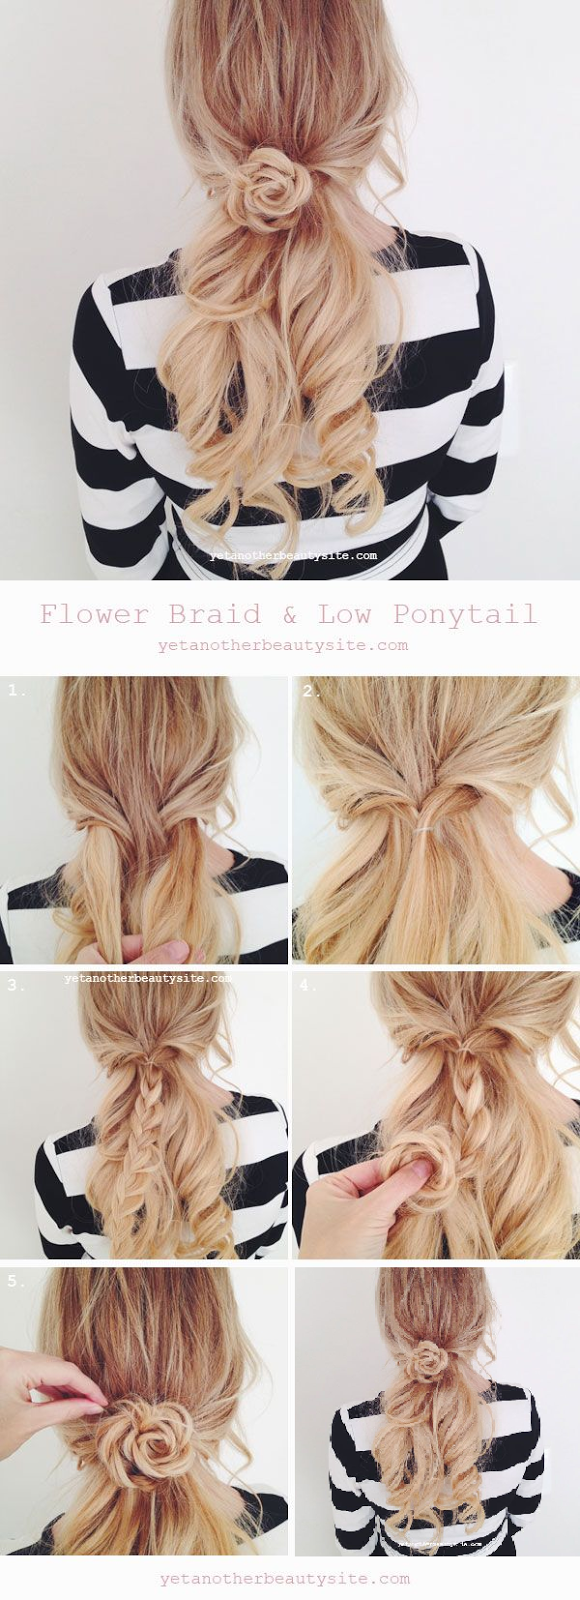 Braided Flower Hairstyle